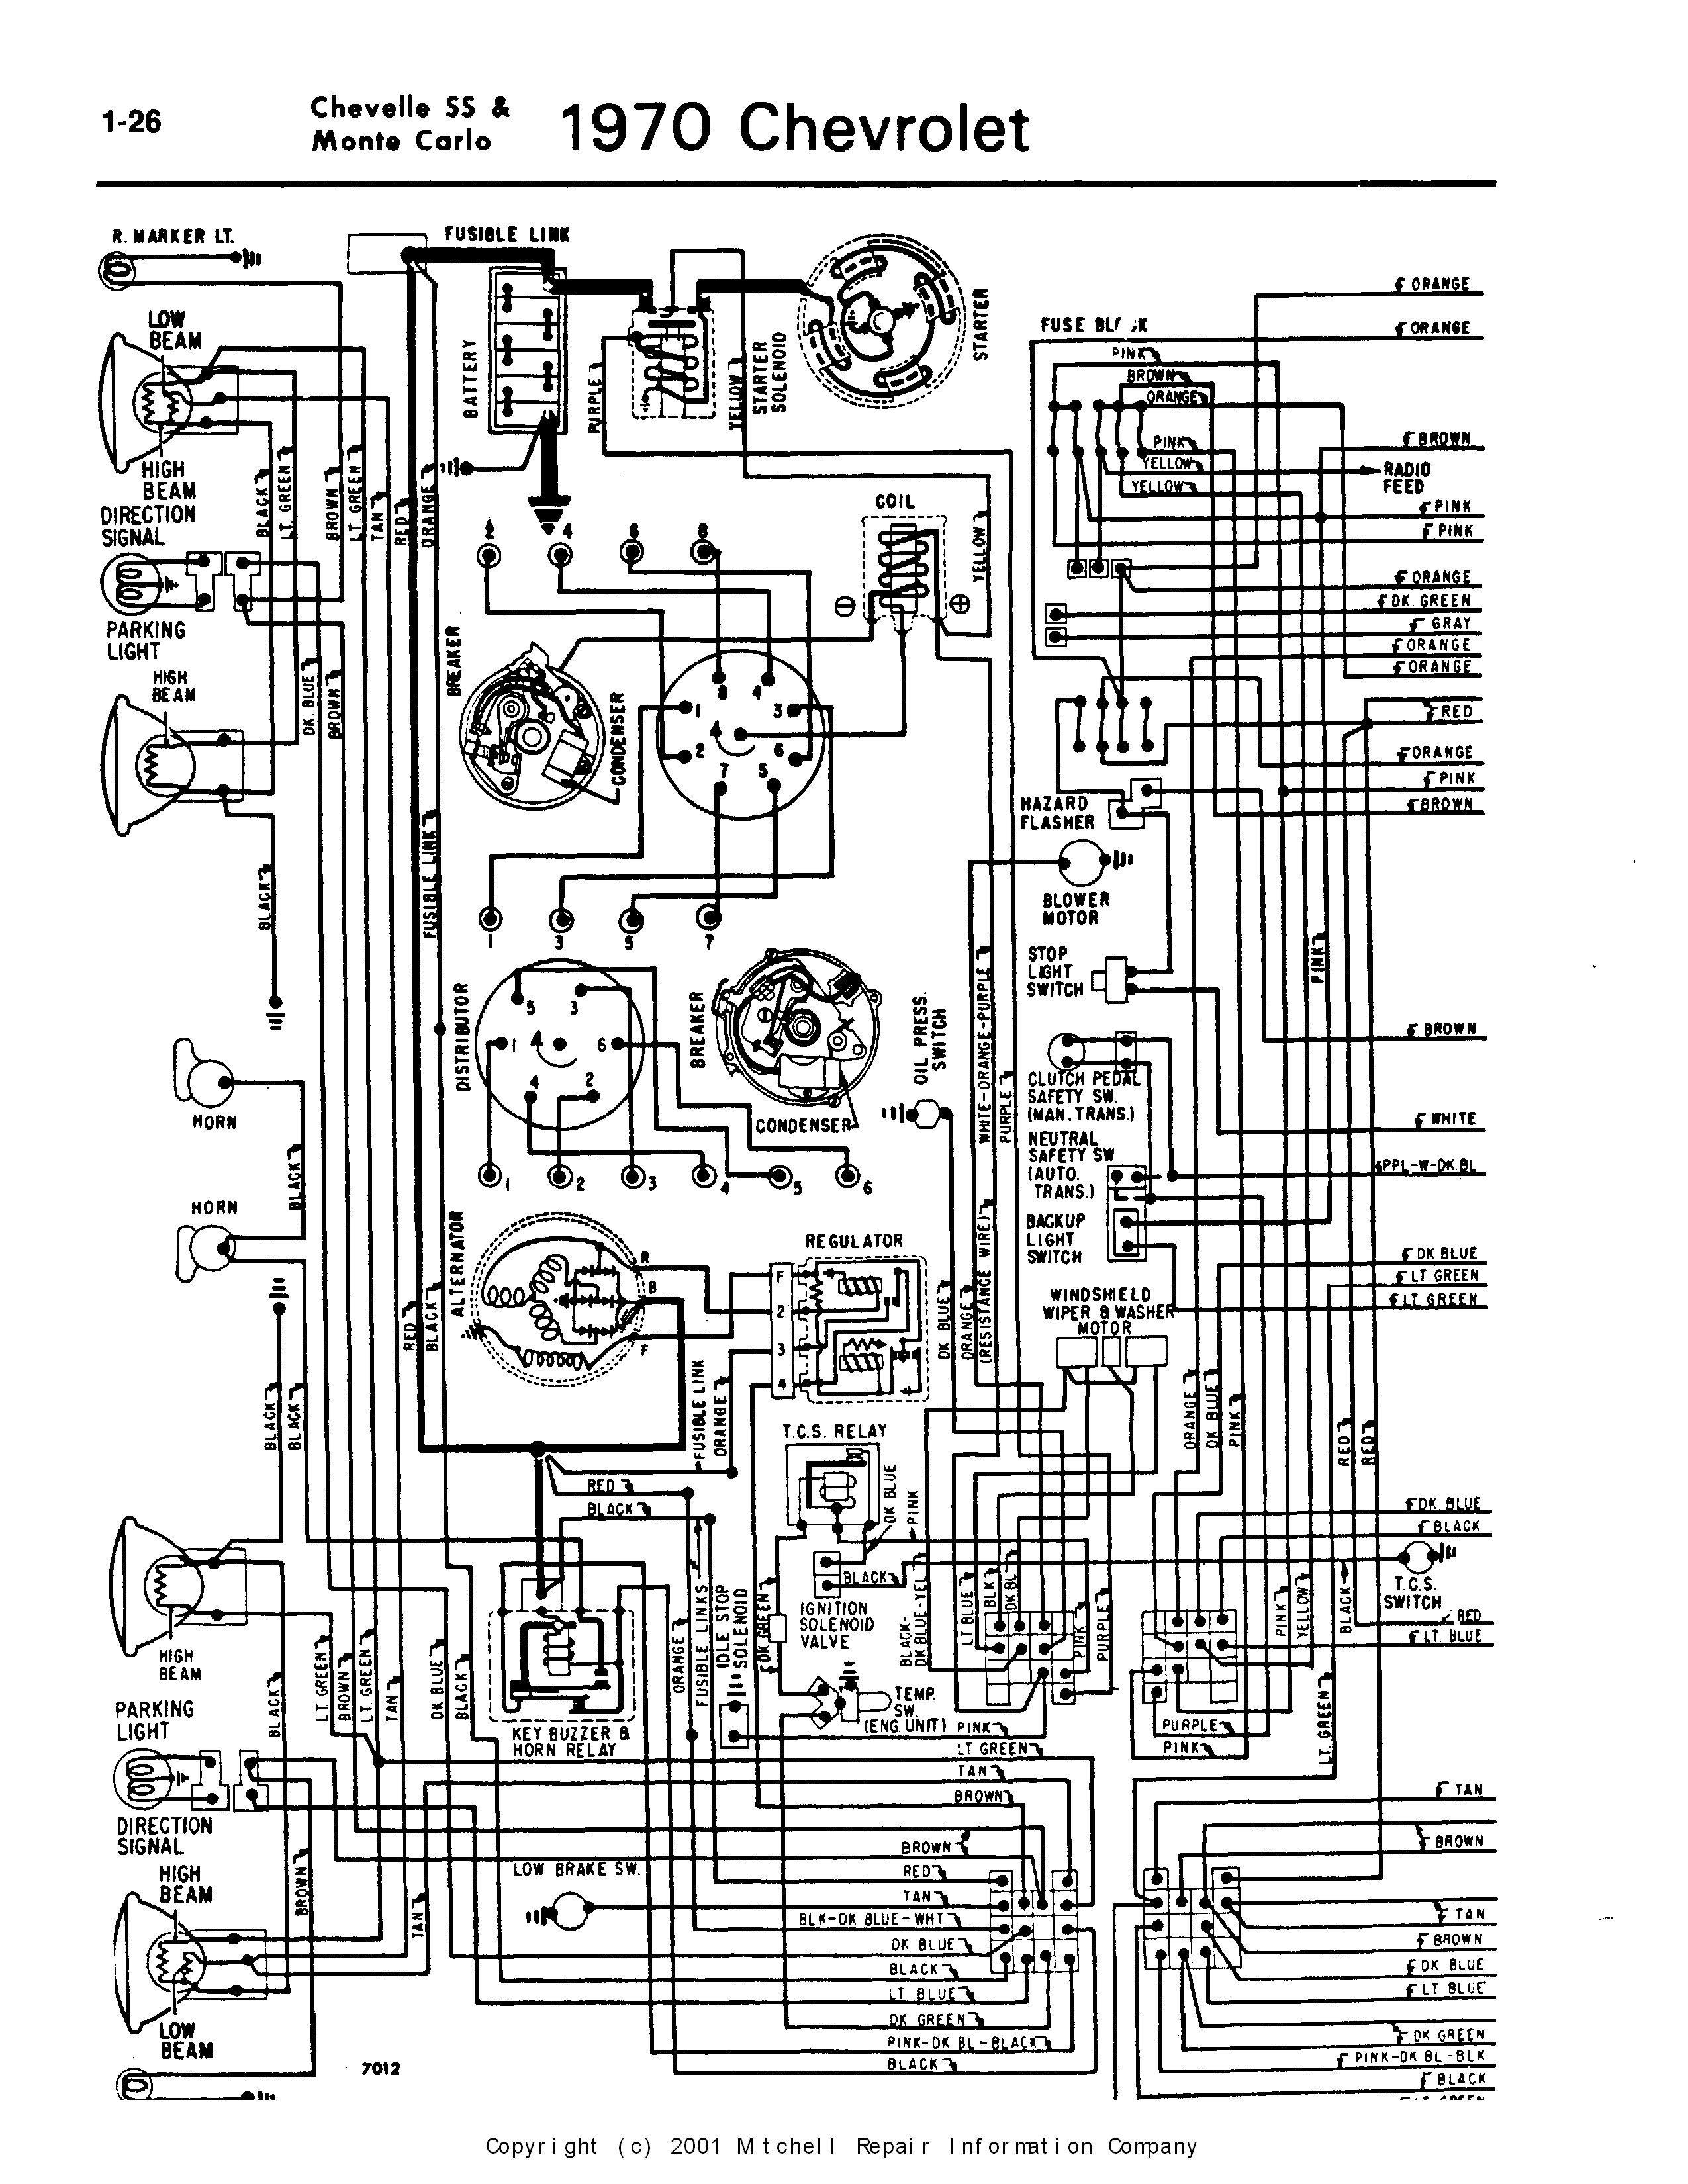 [FPER_4992]  1966 Chevelle Wiring Diagram Online | Wiring Diagram | 1966 Chevelle Ignition Wiring Diagram |  | Wiring Diagram - AutoScout24